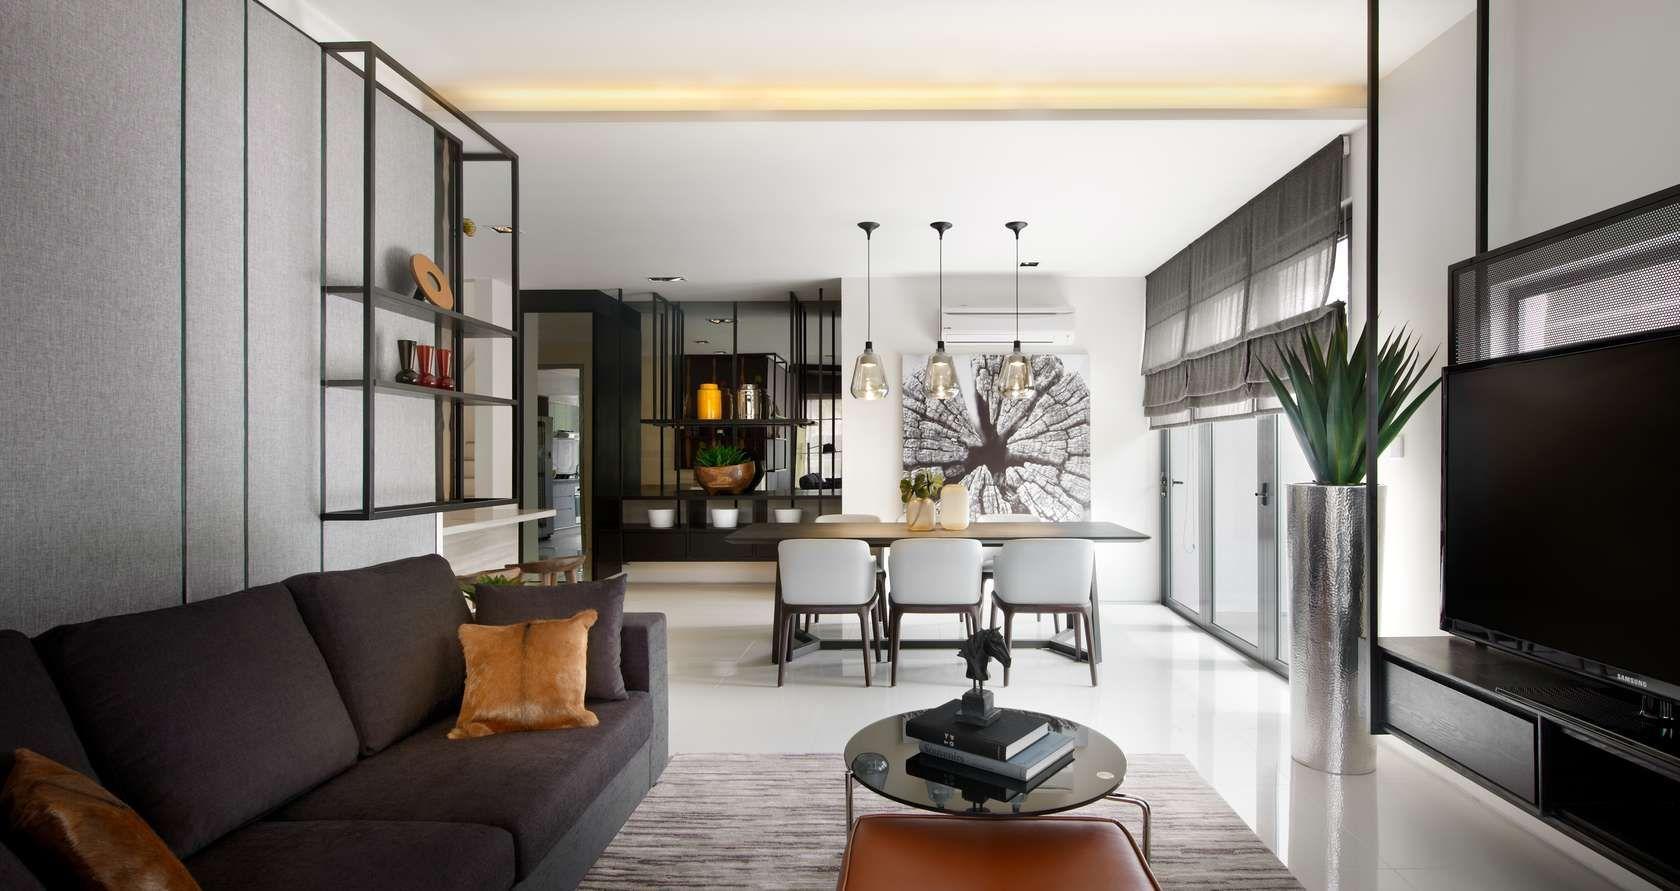 Mulberry house living room designs living room interior home living room apartment interior